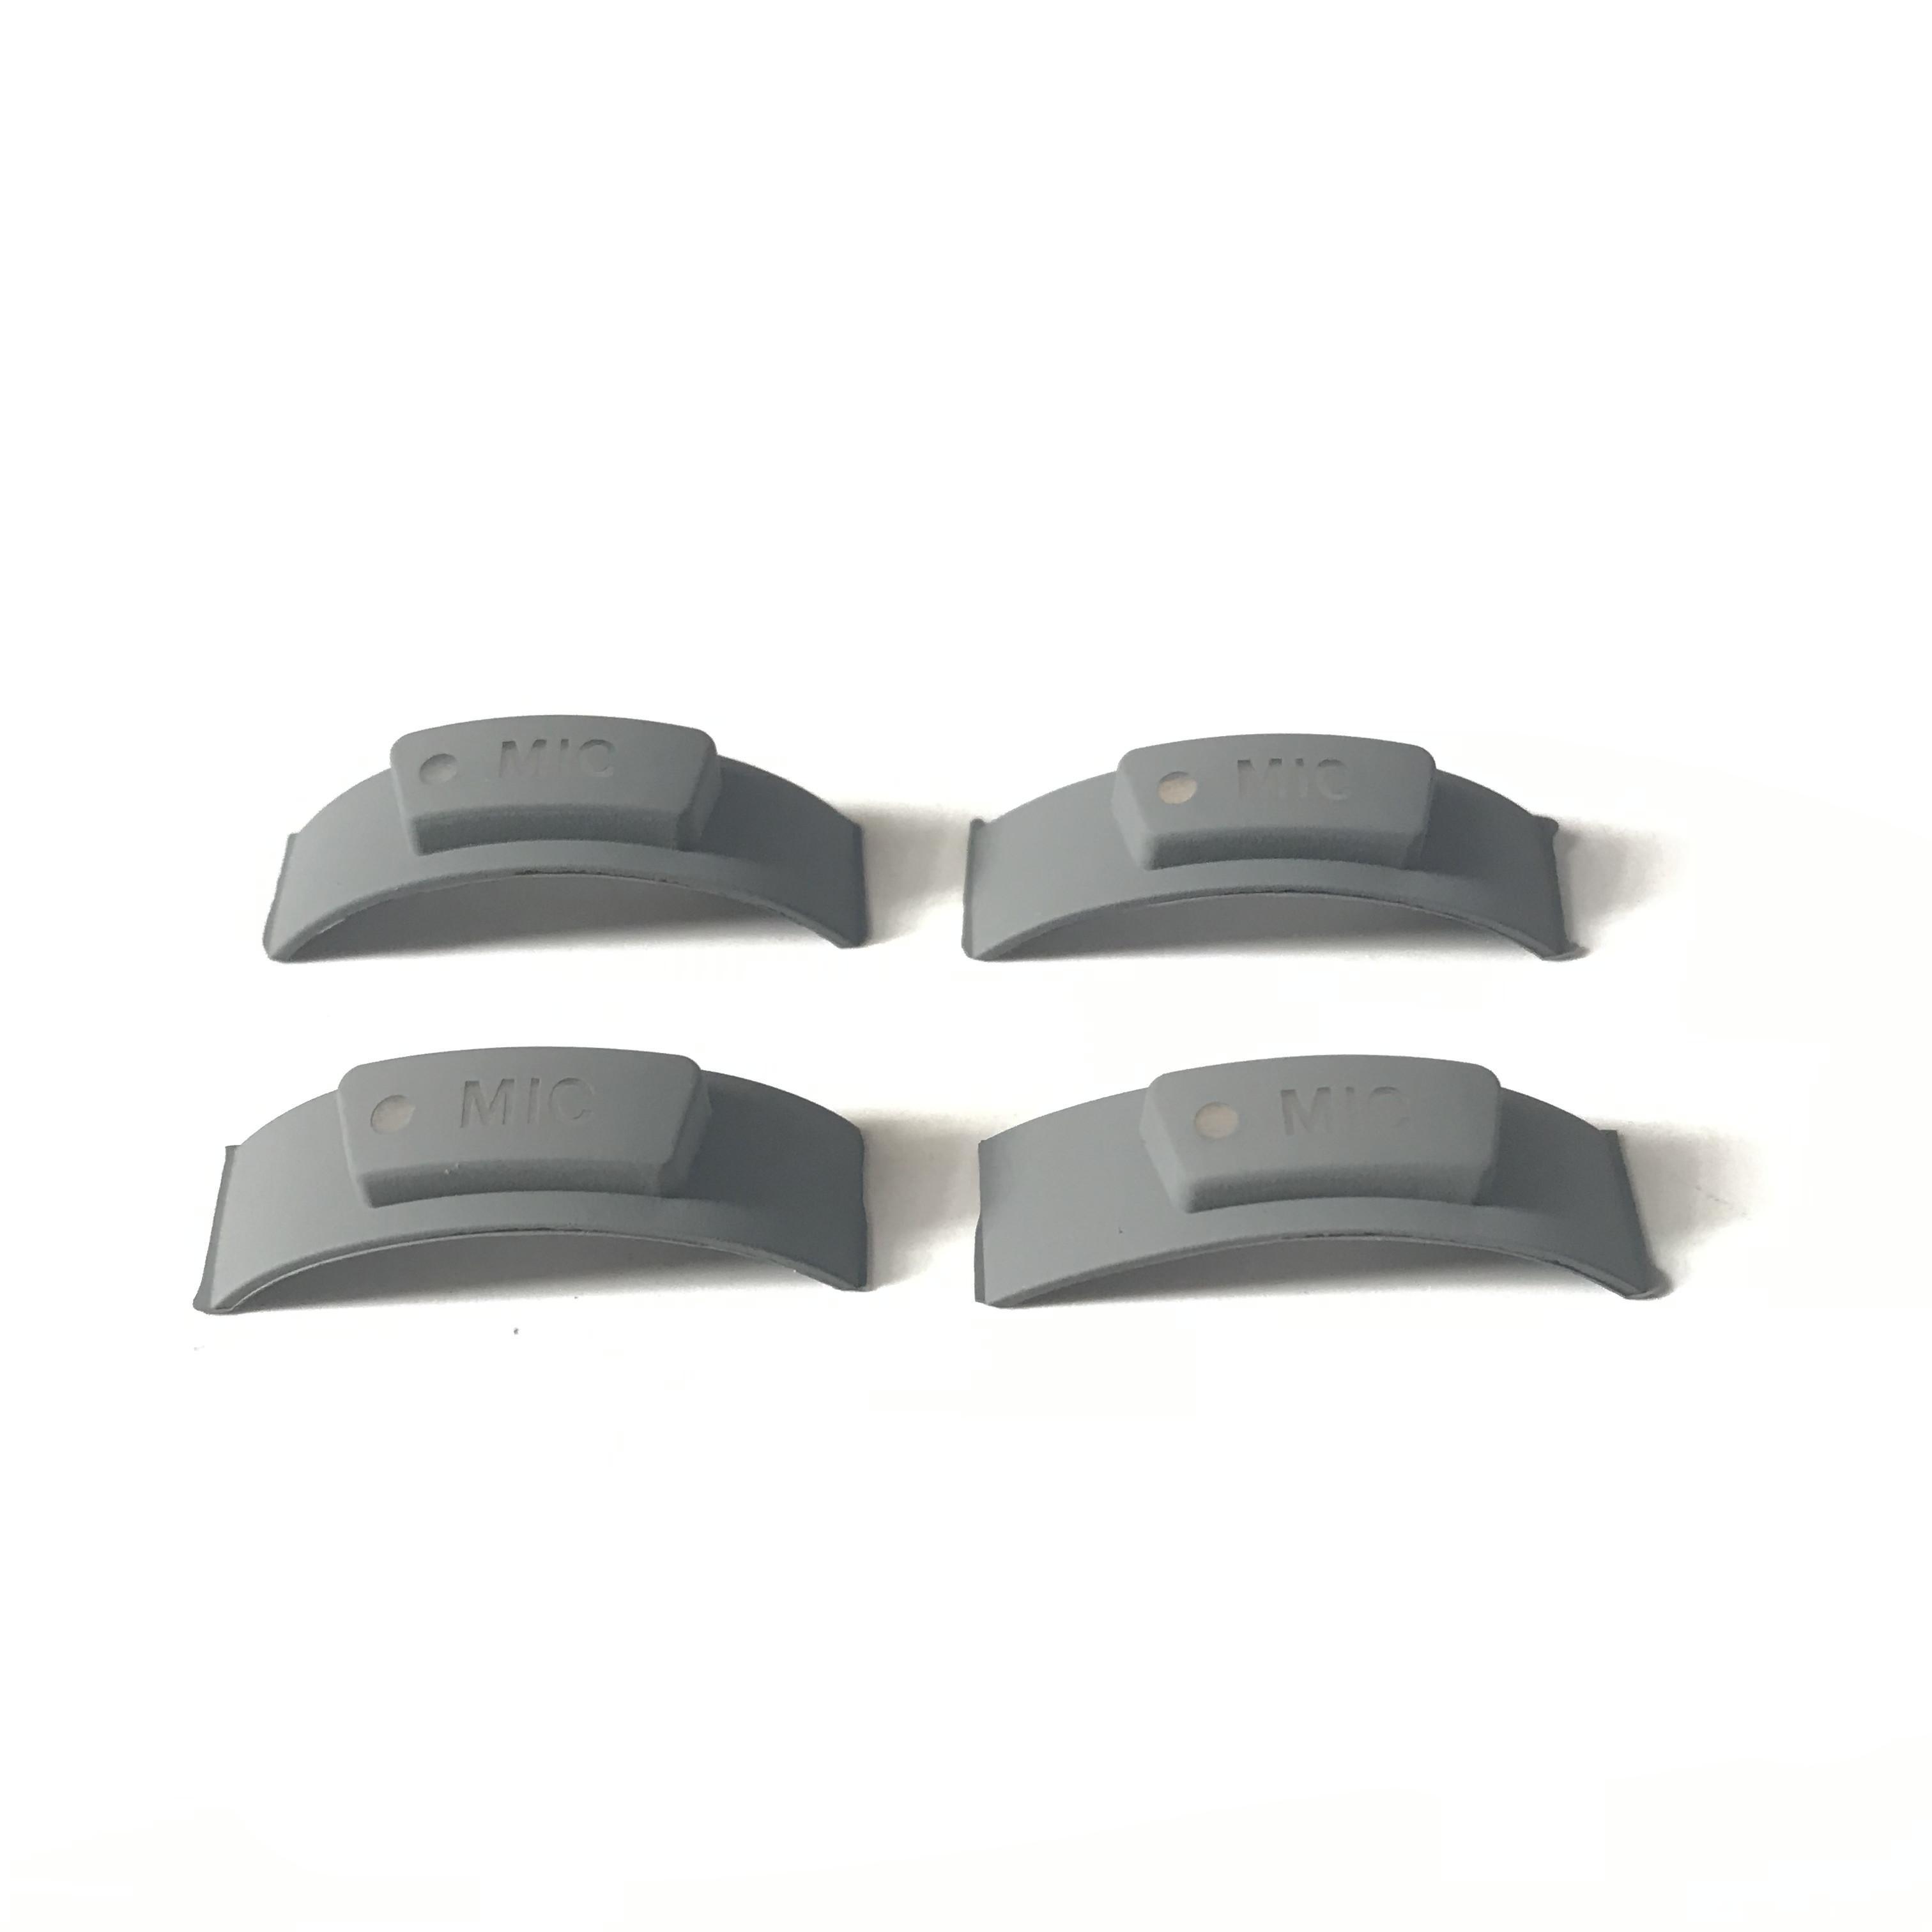 4pcs High quality microphone Press Fittings Button For Sennheiser SKM 300-845 G3 1pcs